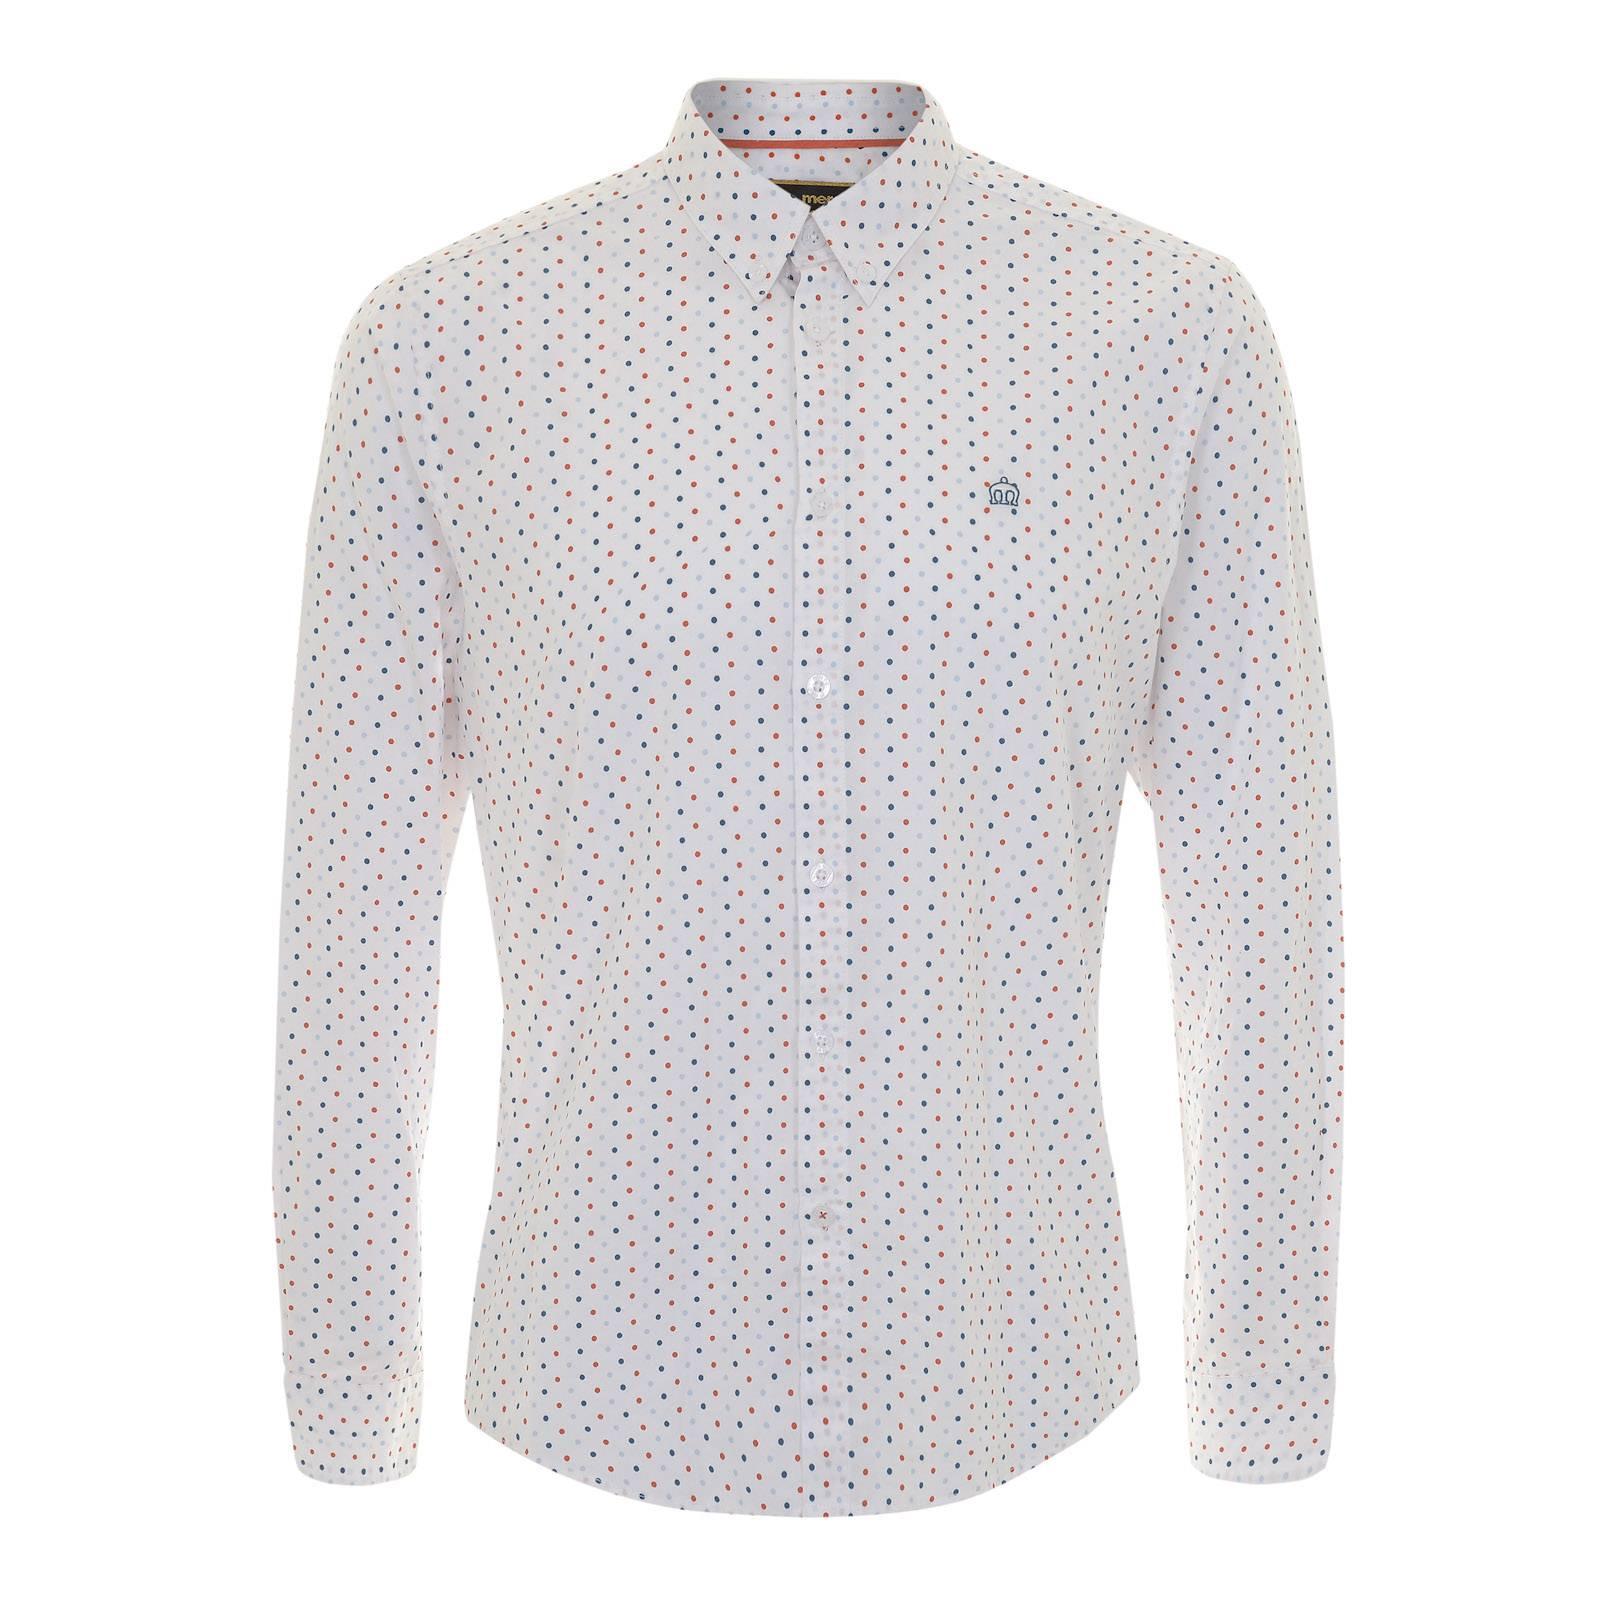 Рубашка CrescentAW16 PROMO SALE<br><br><br>Артикул: 1515114<br>Материал: 100% хлопок<br>Цвет: белый<br>Пол: Мужской